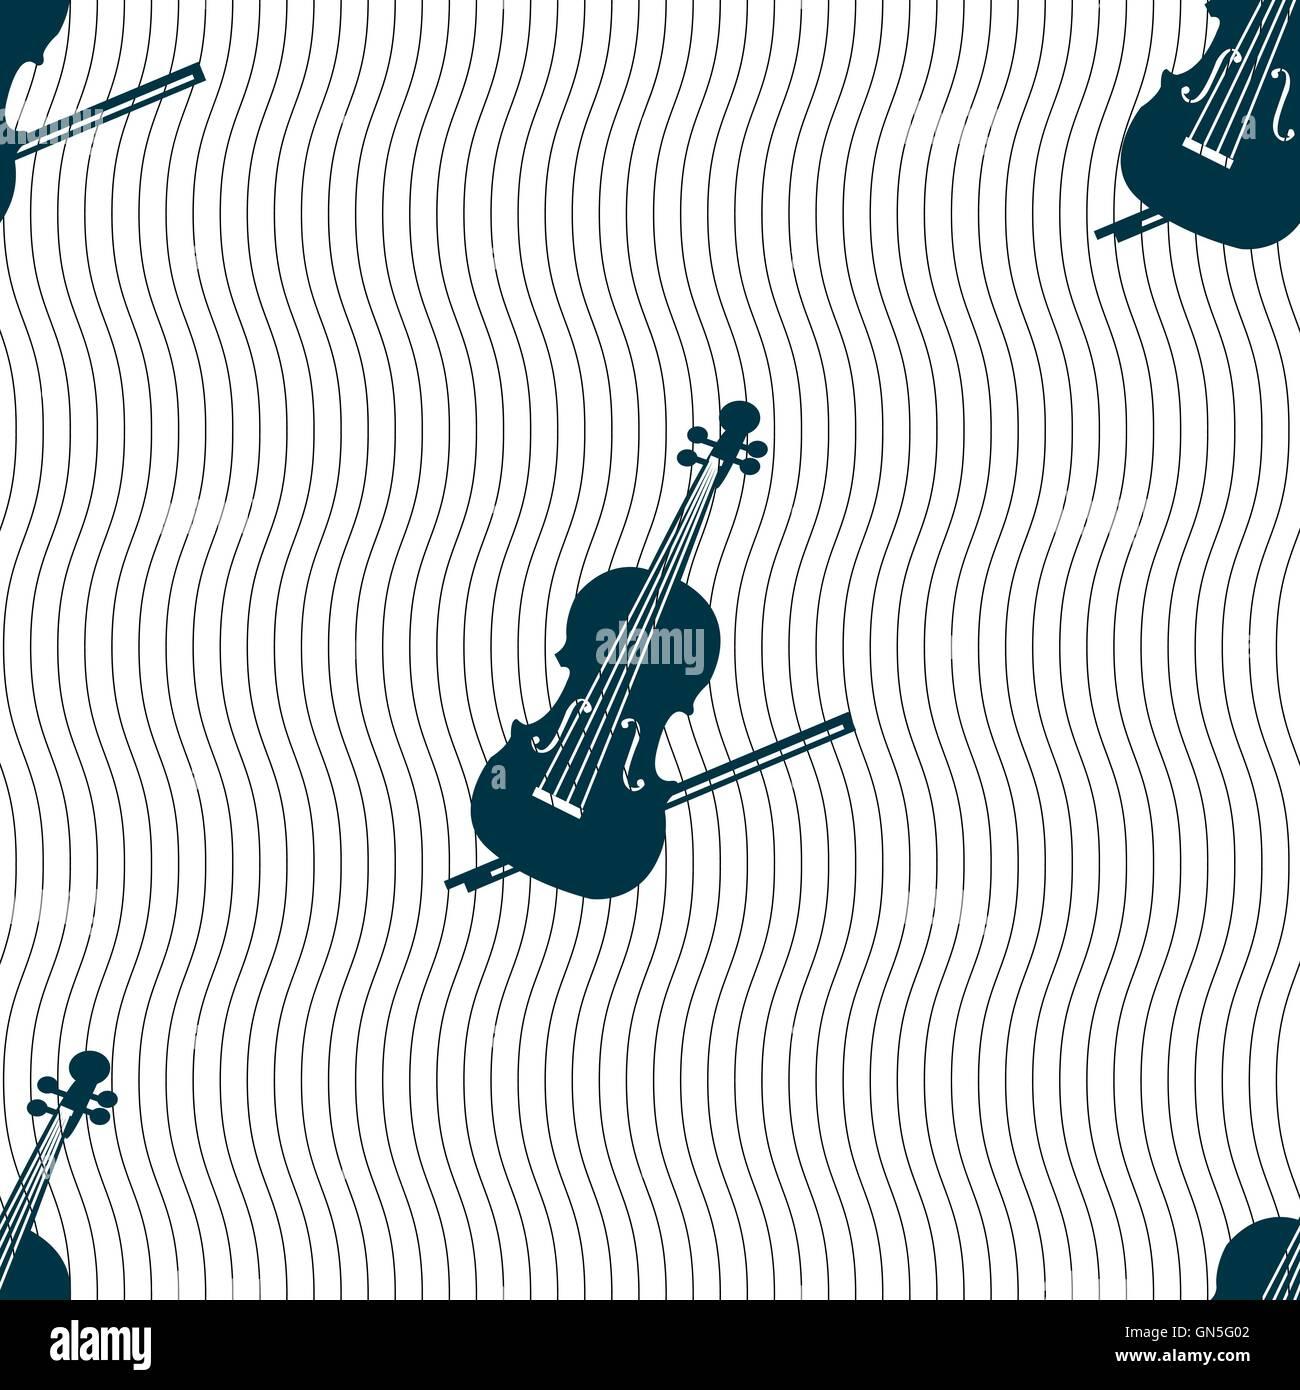 Violin Icon Stock Photos & Violin Icon Stock Images - Alamy